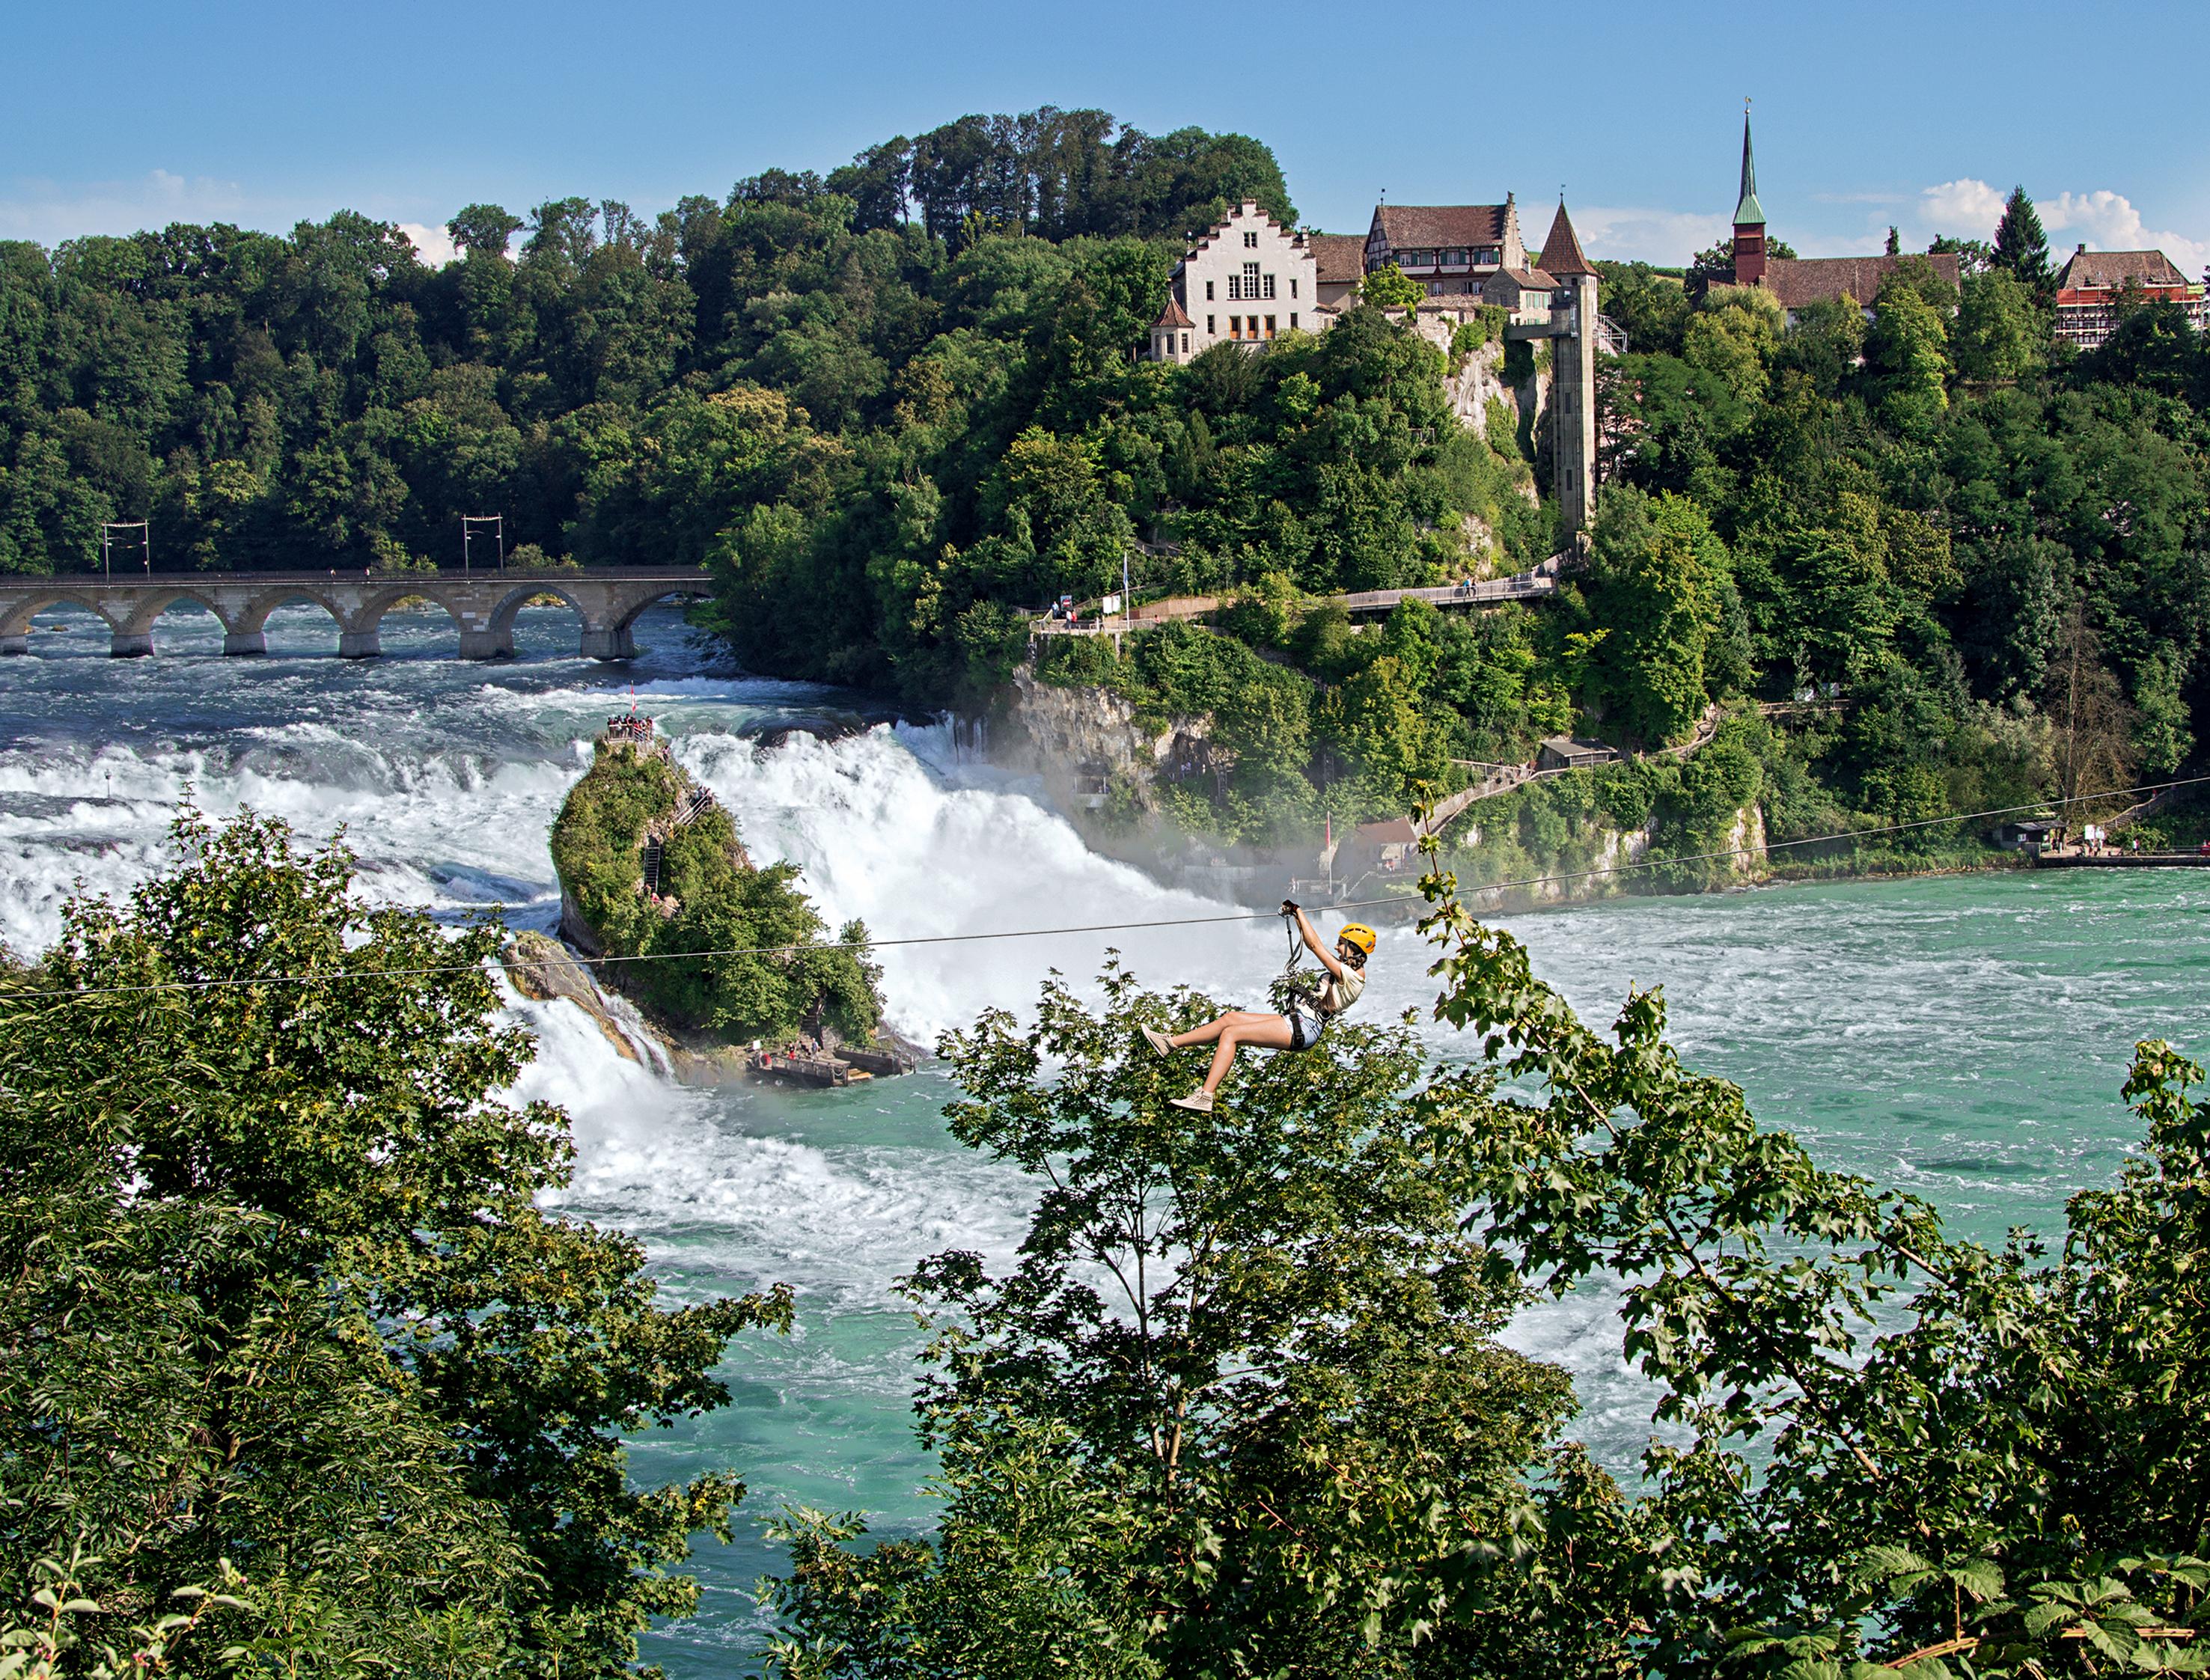 Adventure Park am Rheinfall